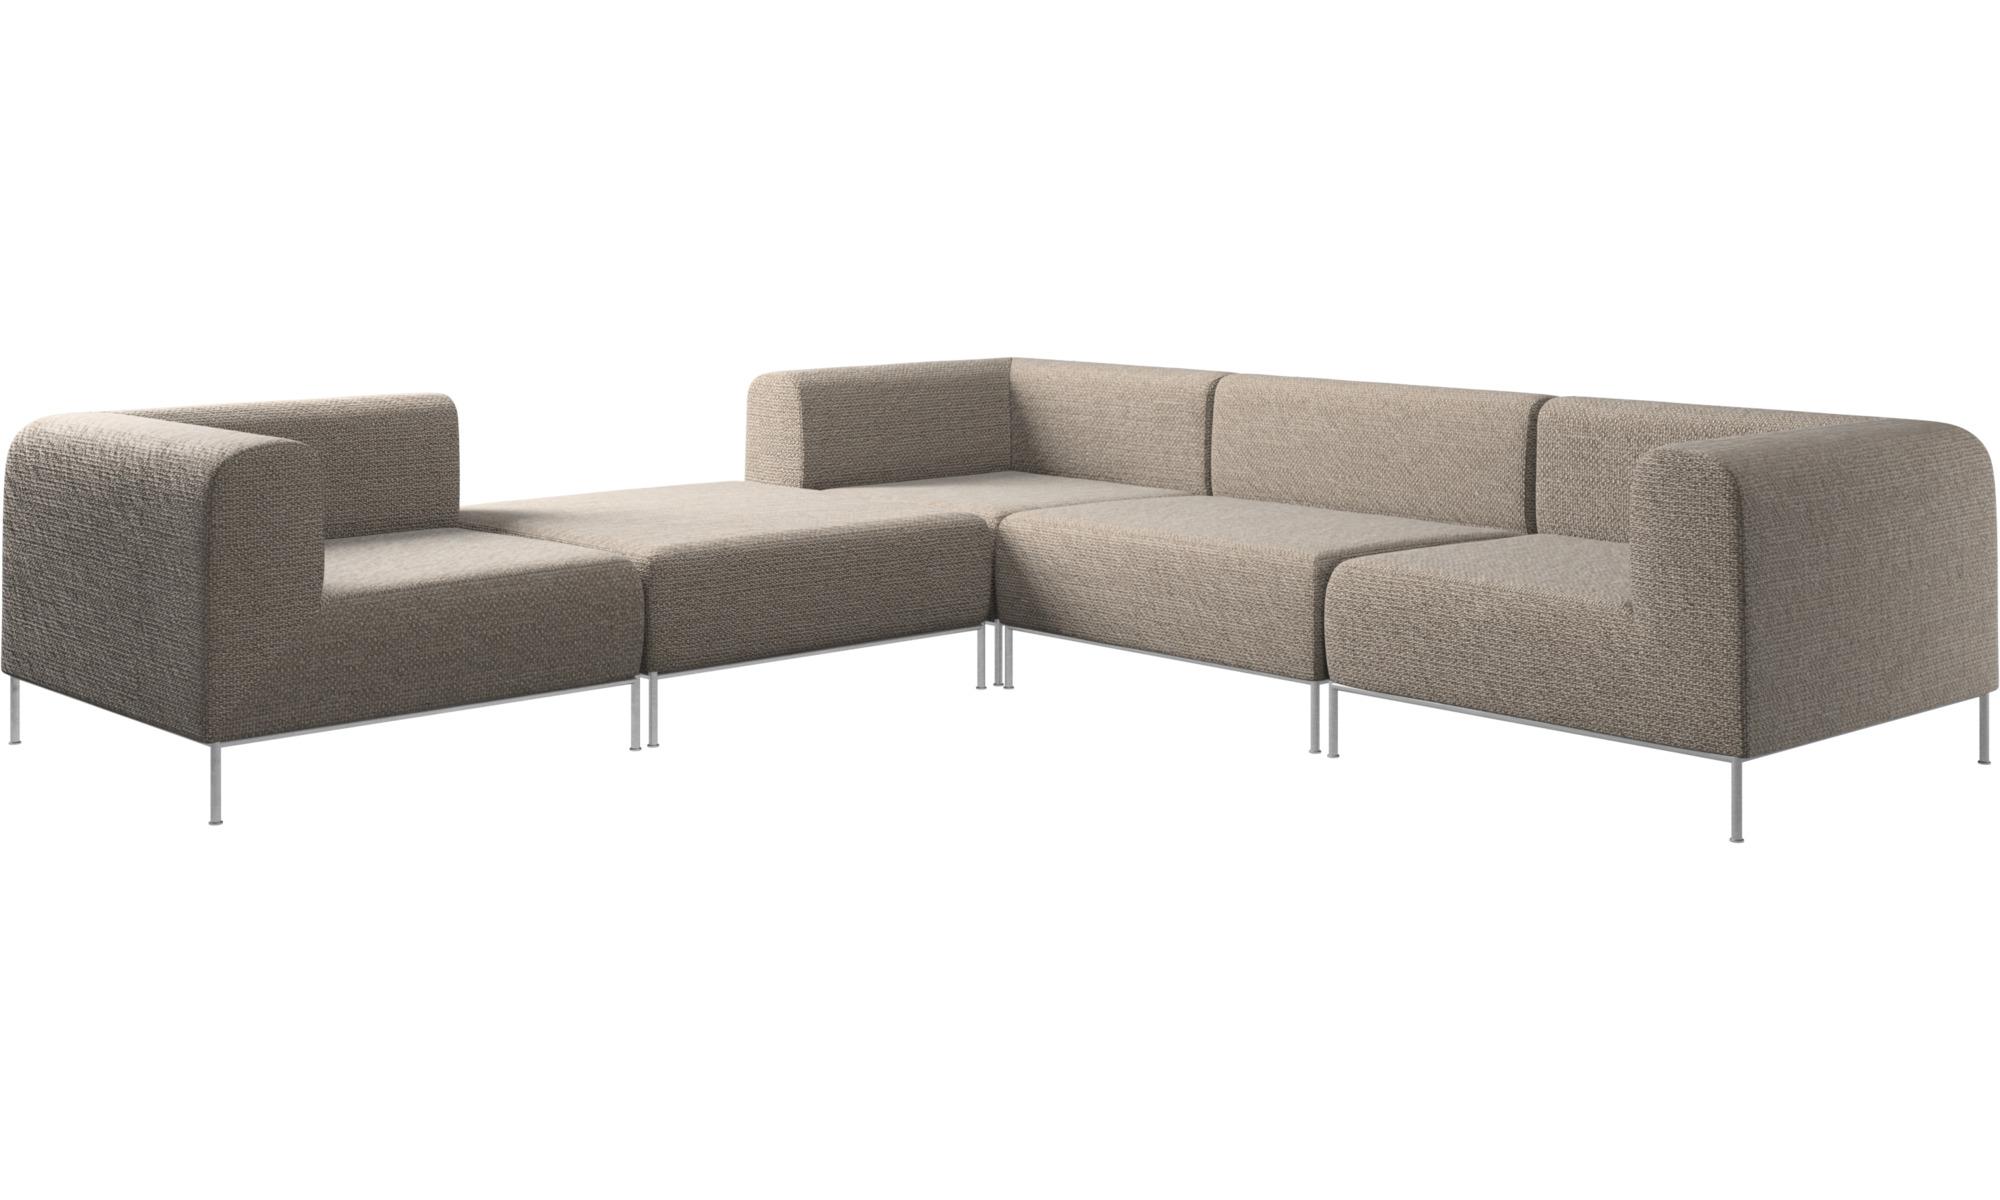 Modular Sofas Miami Corner Sofa With Pouf On Left Side Brown Fabric